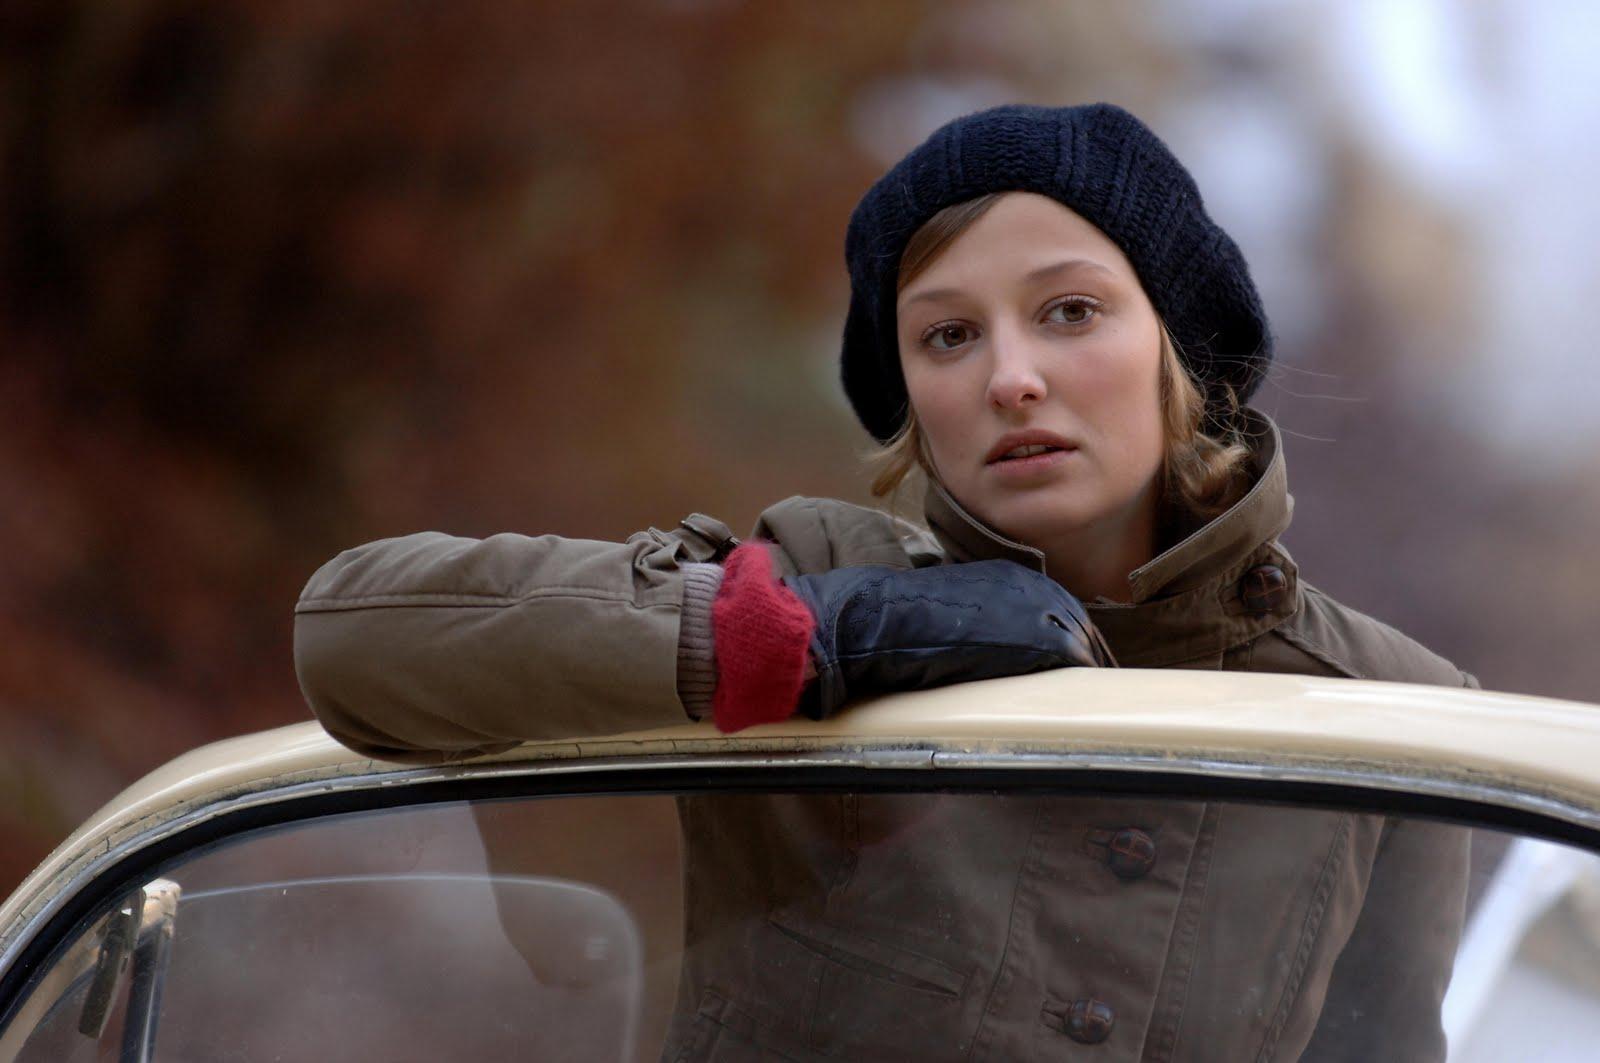 Rachelle And Cinema Crush On Her